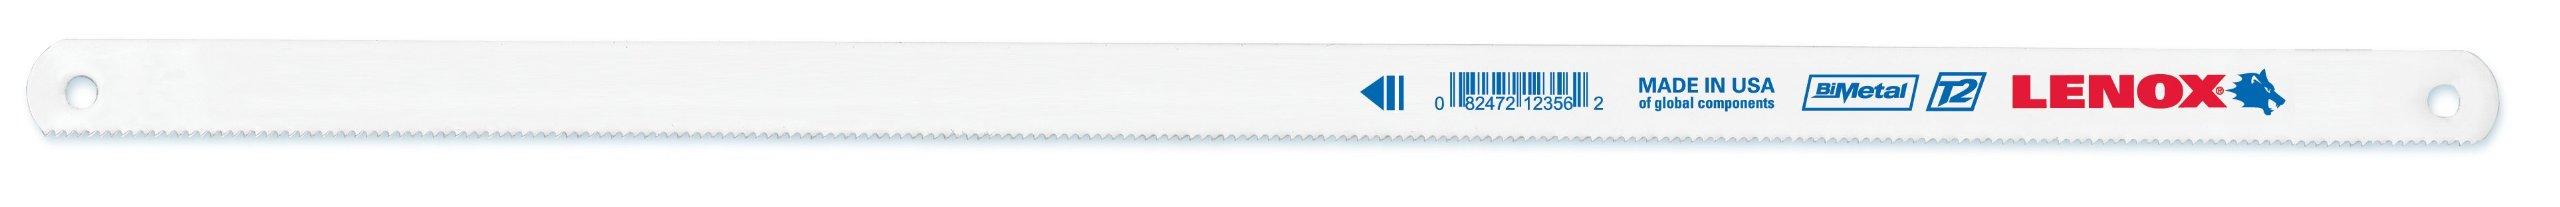 LENOX Tools Hacksaw Blade, 12-inch, 14 TPI, 10-Pack (20143V214HE) by Lenox Tools